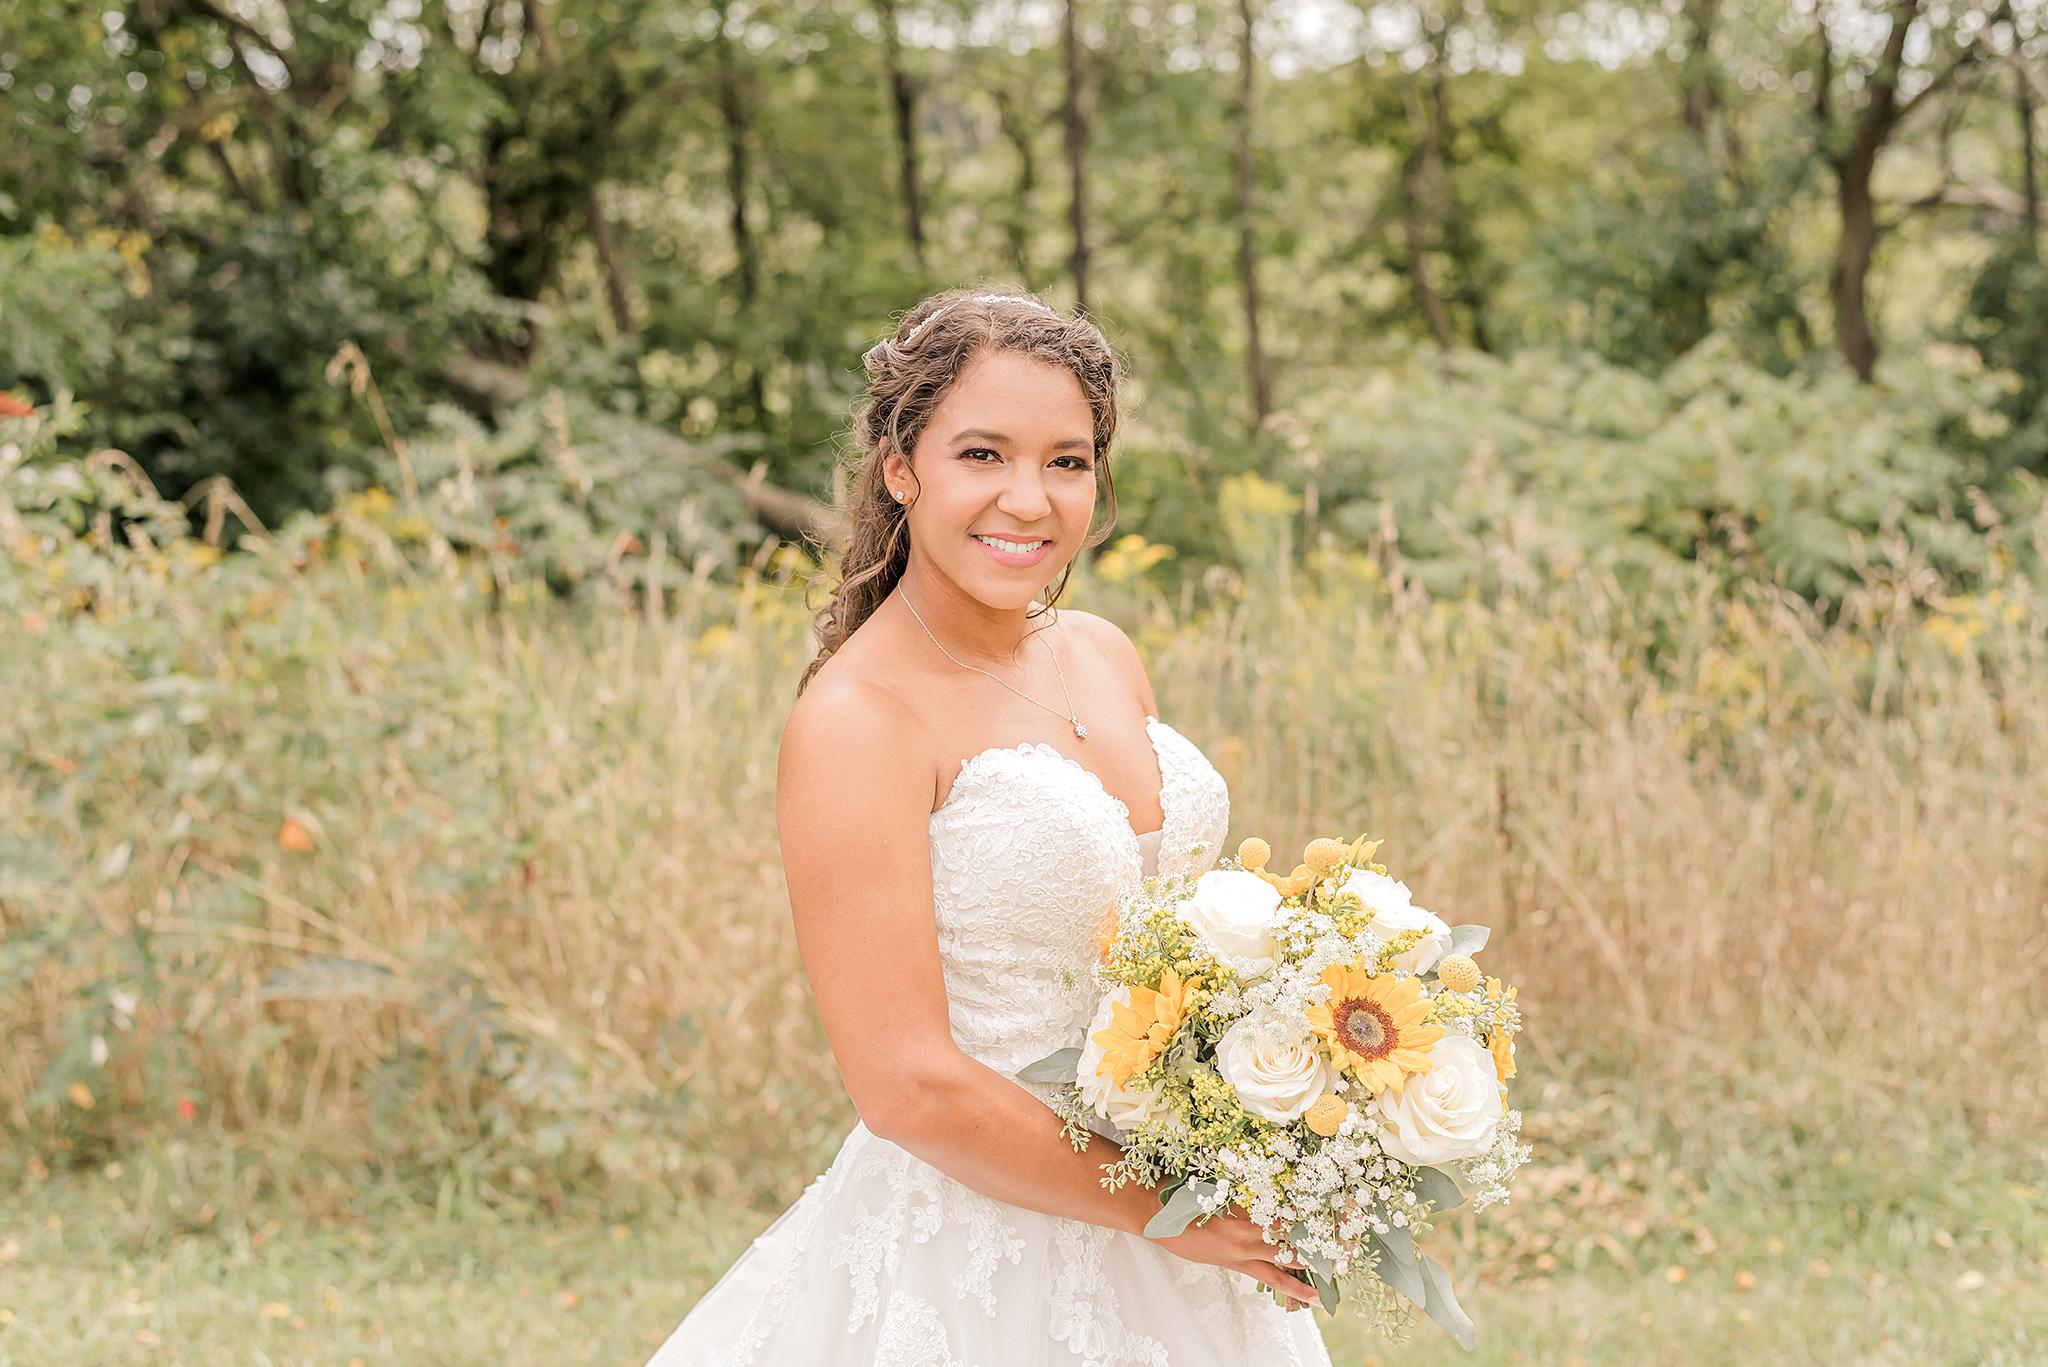 Lindsay-Adkins-Photography-Michigan-Wedding-Photographer-Miller-17